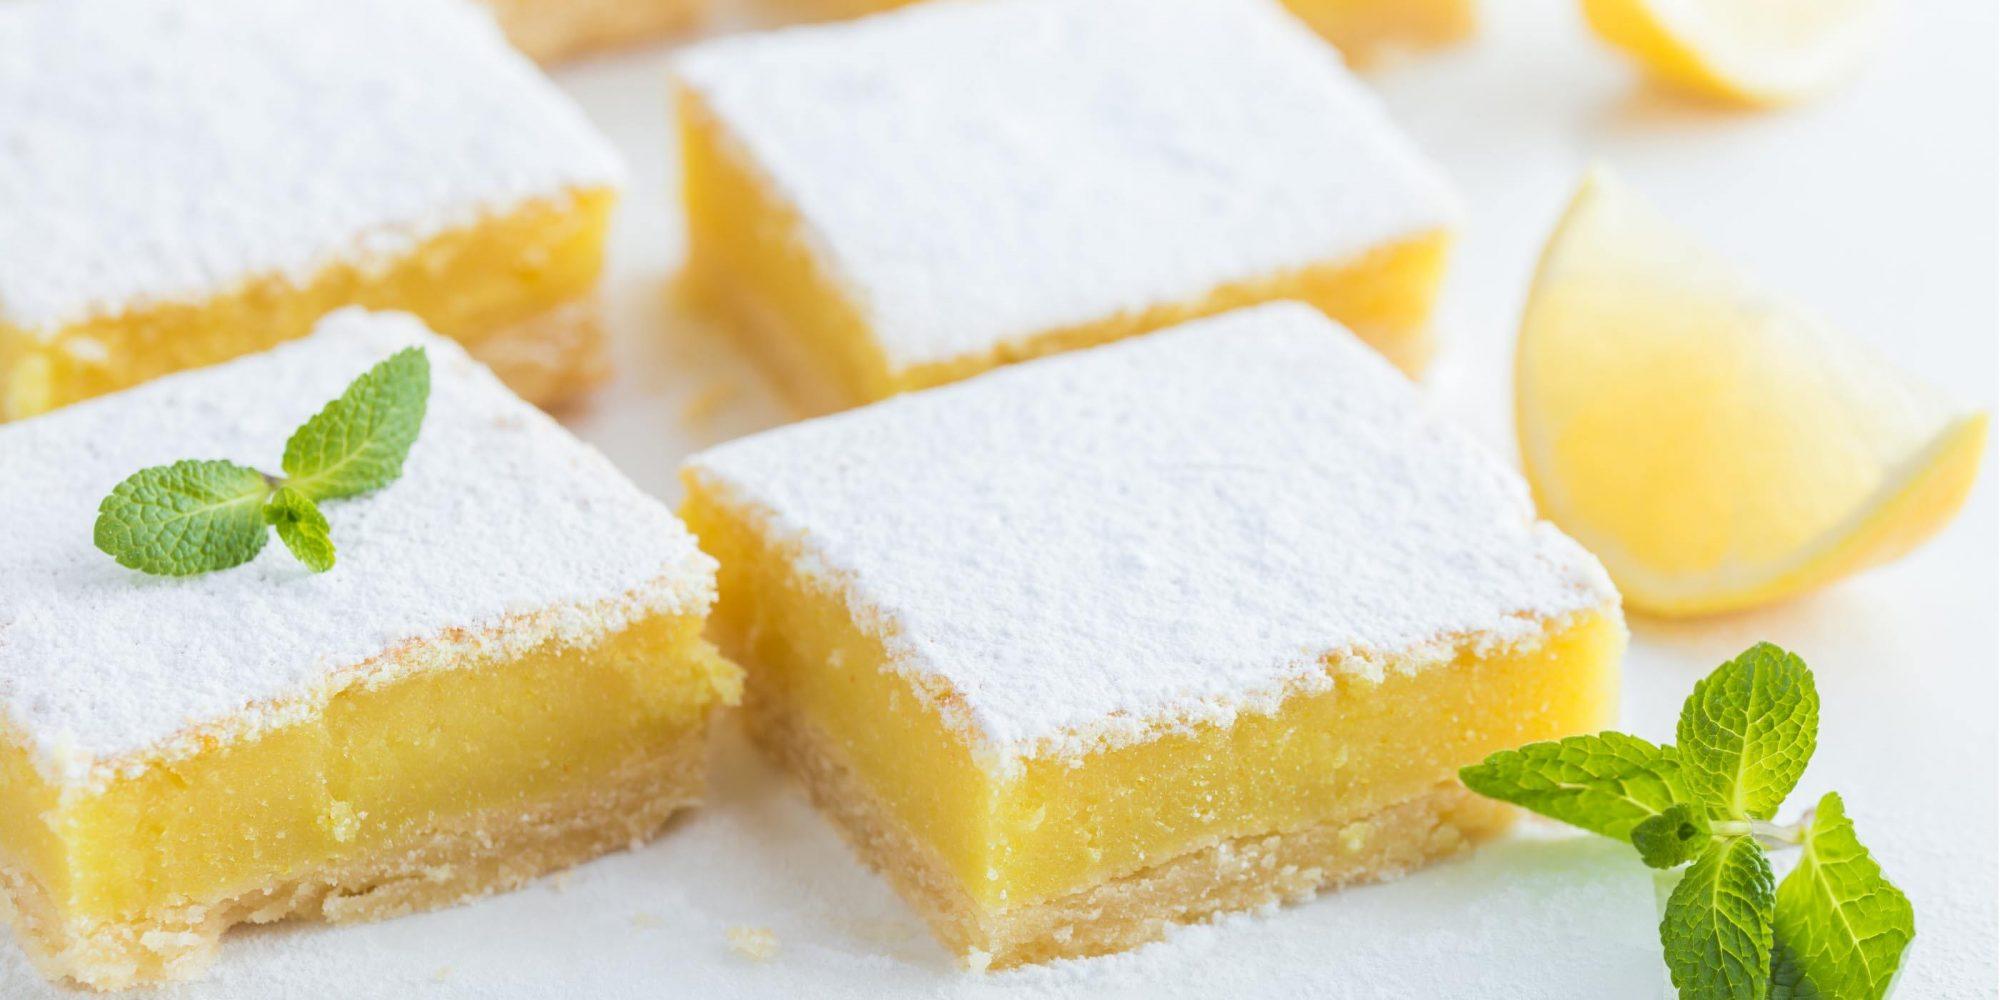 Creamy Lemon Bars